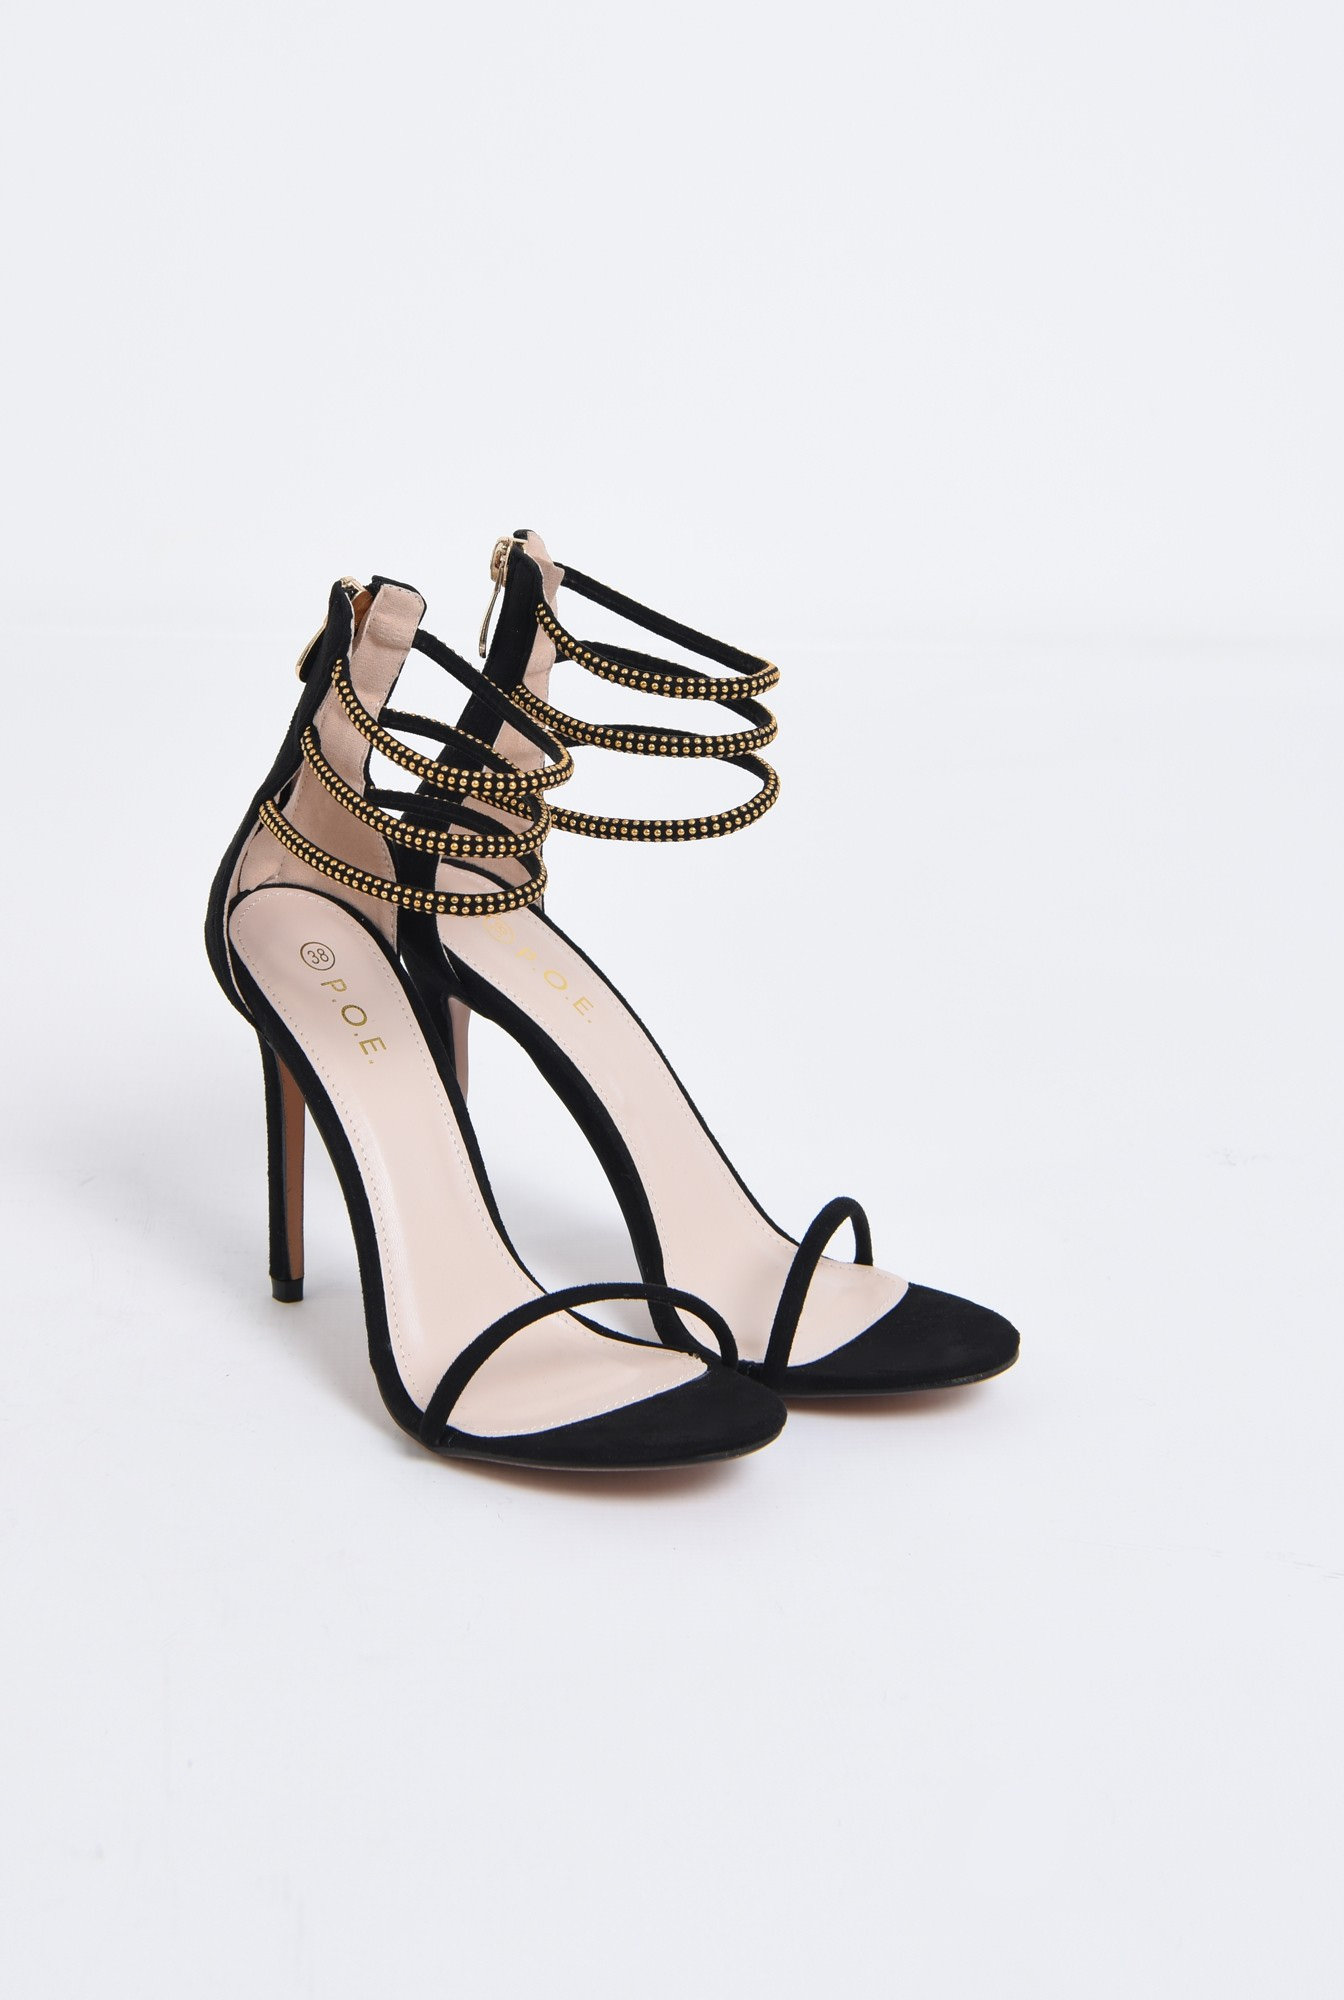 1 - sandale elegante, negre, toc inalt, barete cu aplicatii metalice